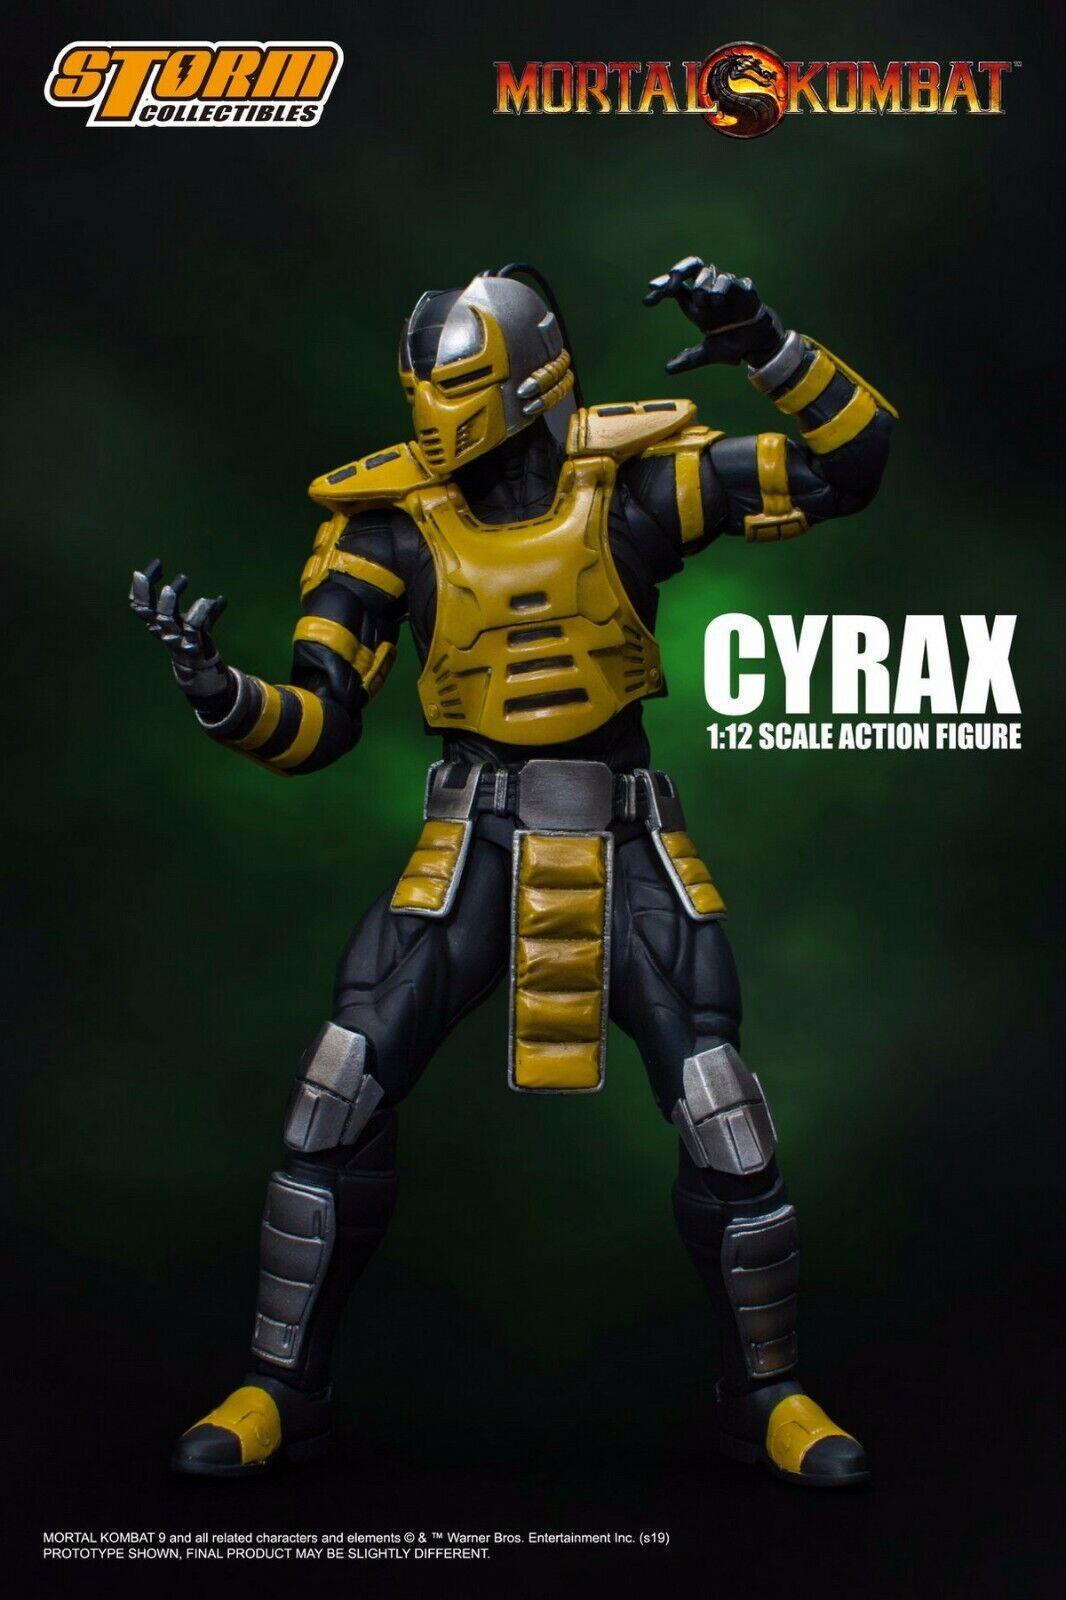 muchas sorpresas Storm Juguetes 1 12 Cyrax mortotal Kombat Figura Set 6 6 6  Muñeca Modelo F Collection  directo de fábrica